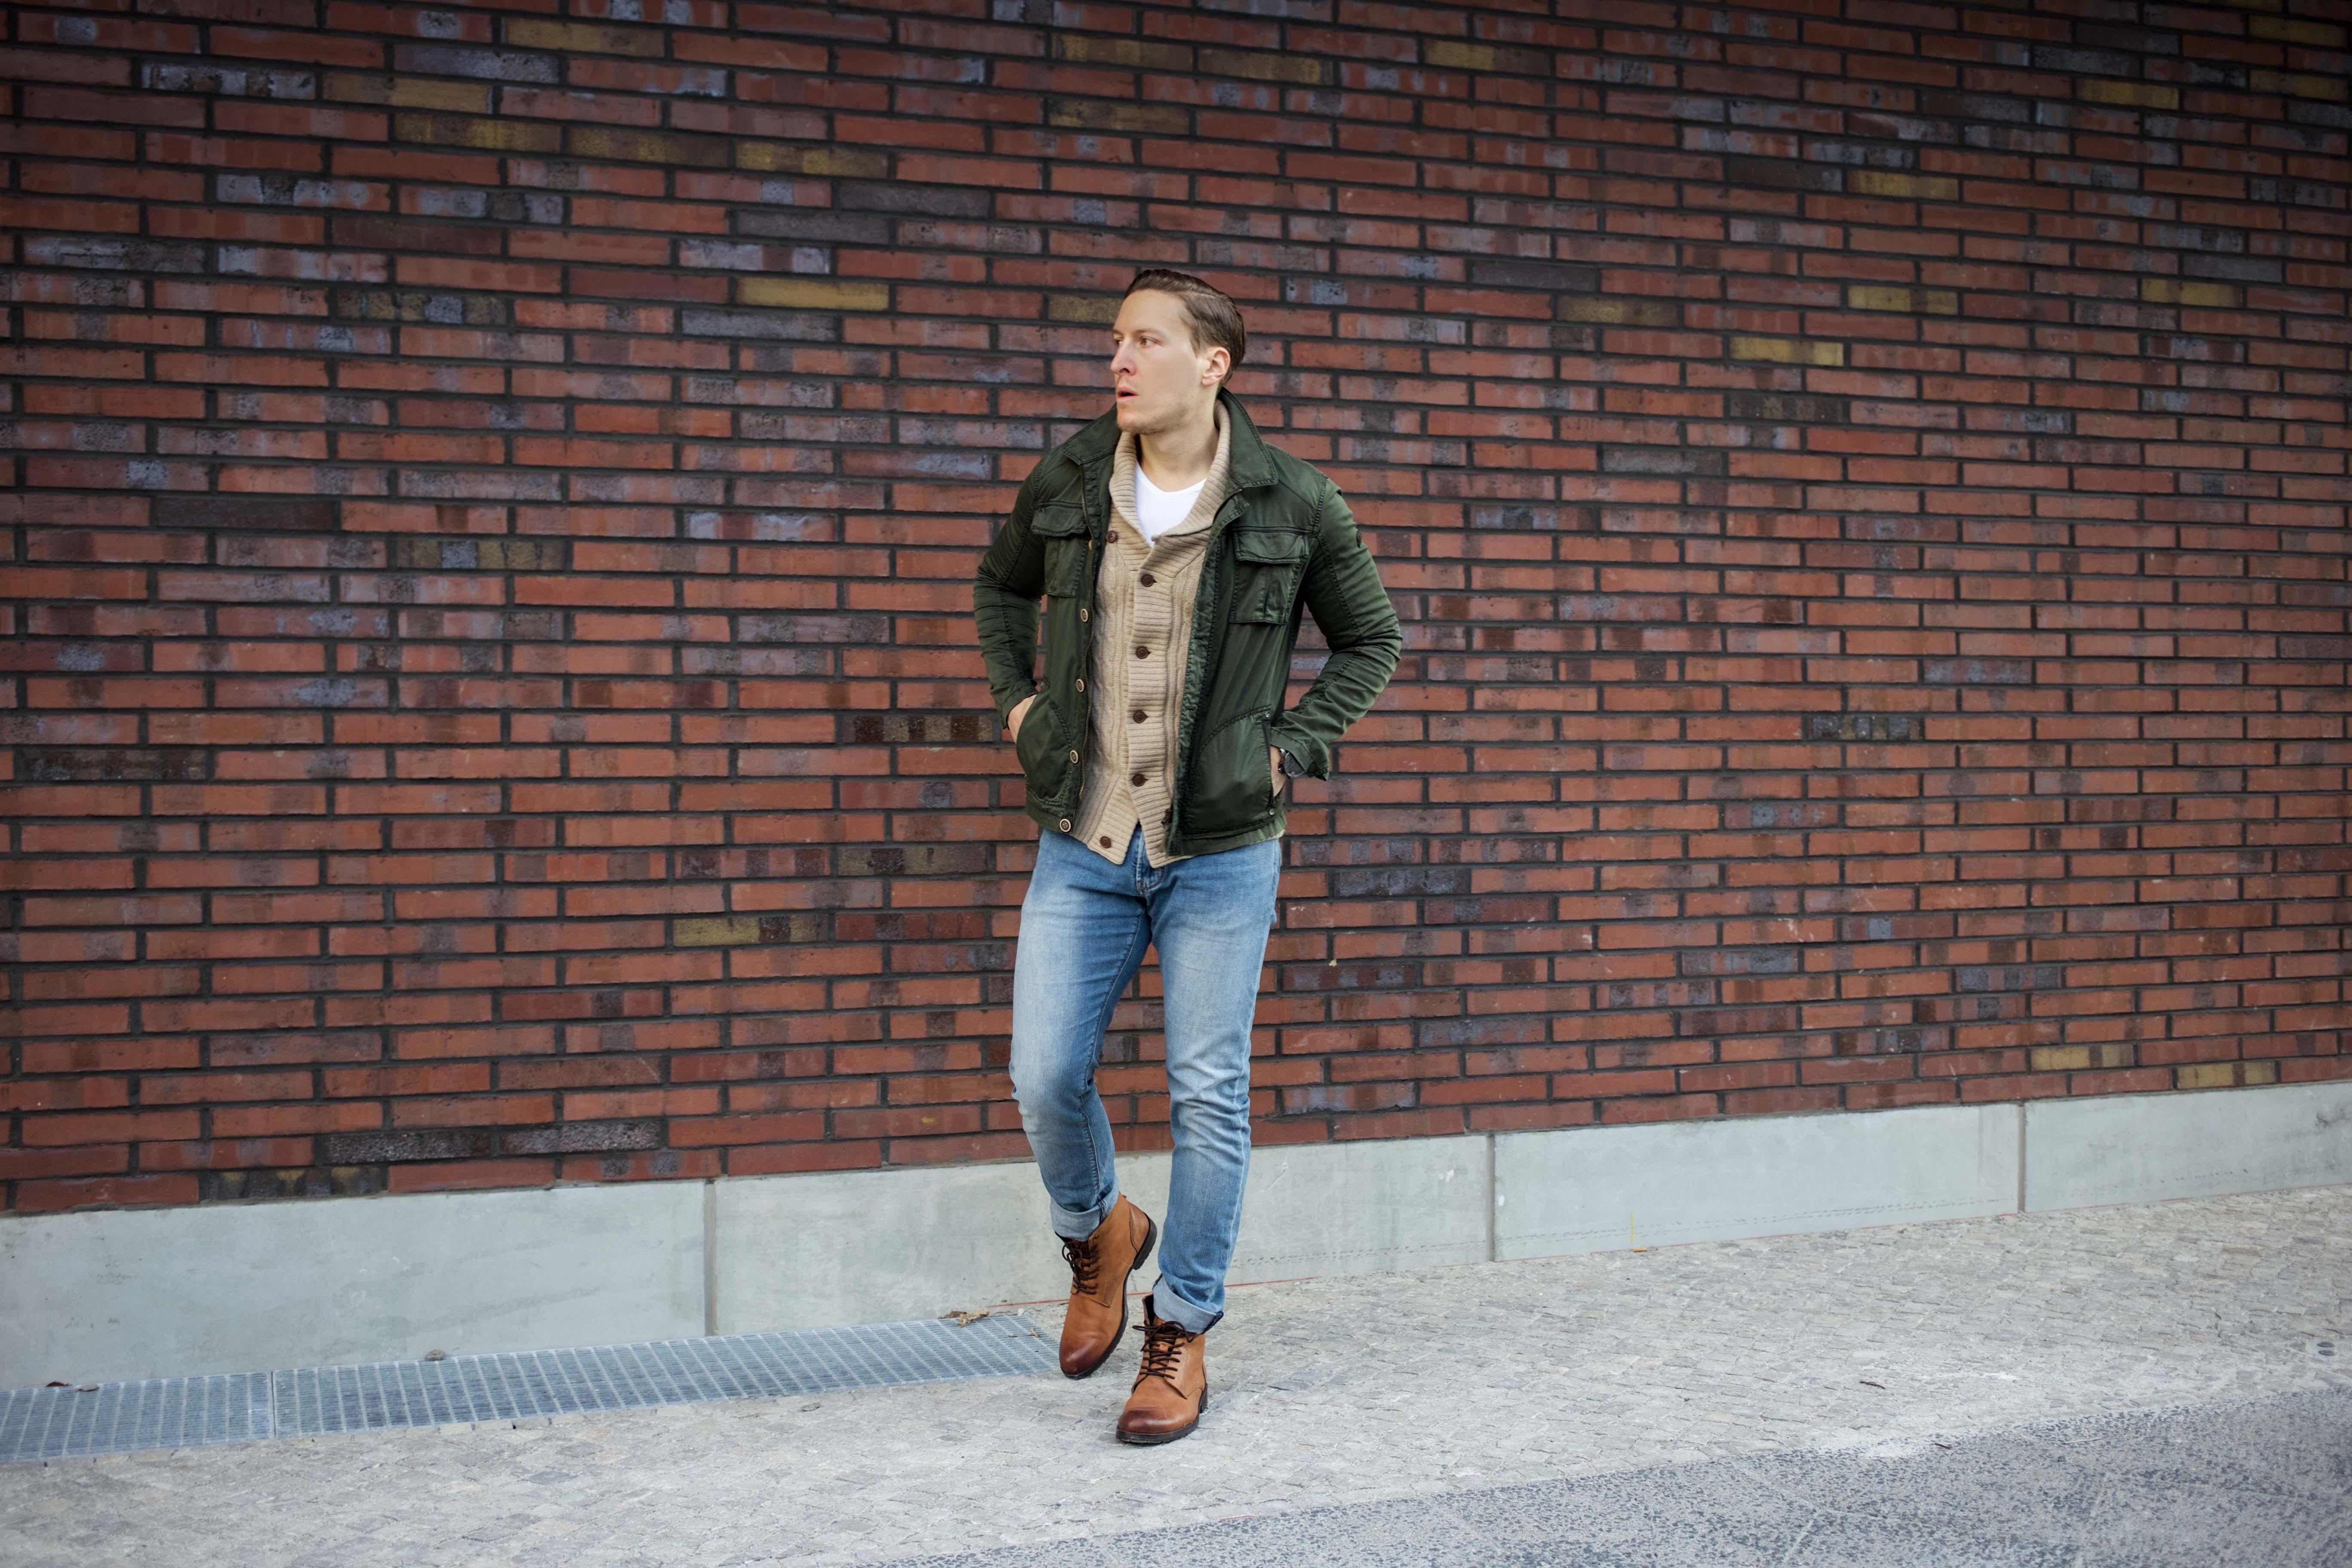 strickjacke-kombinieren-männer-beige-cardigan-blue-jeans-fashionblog-berlin-modeblog_8967